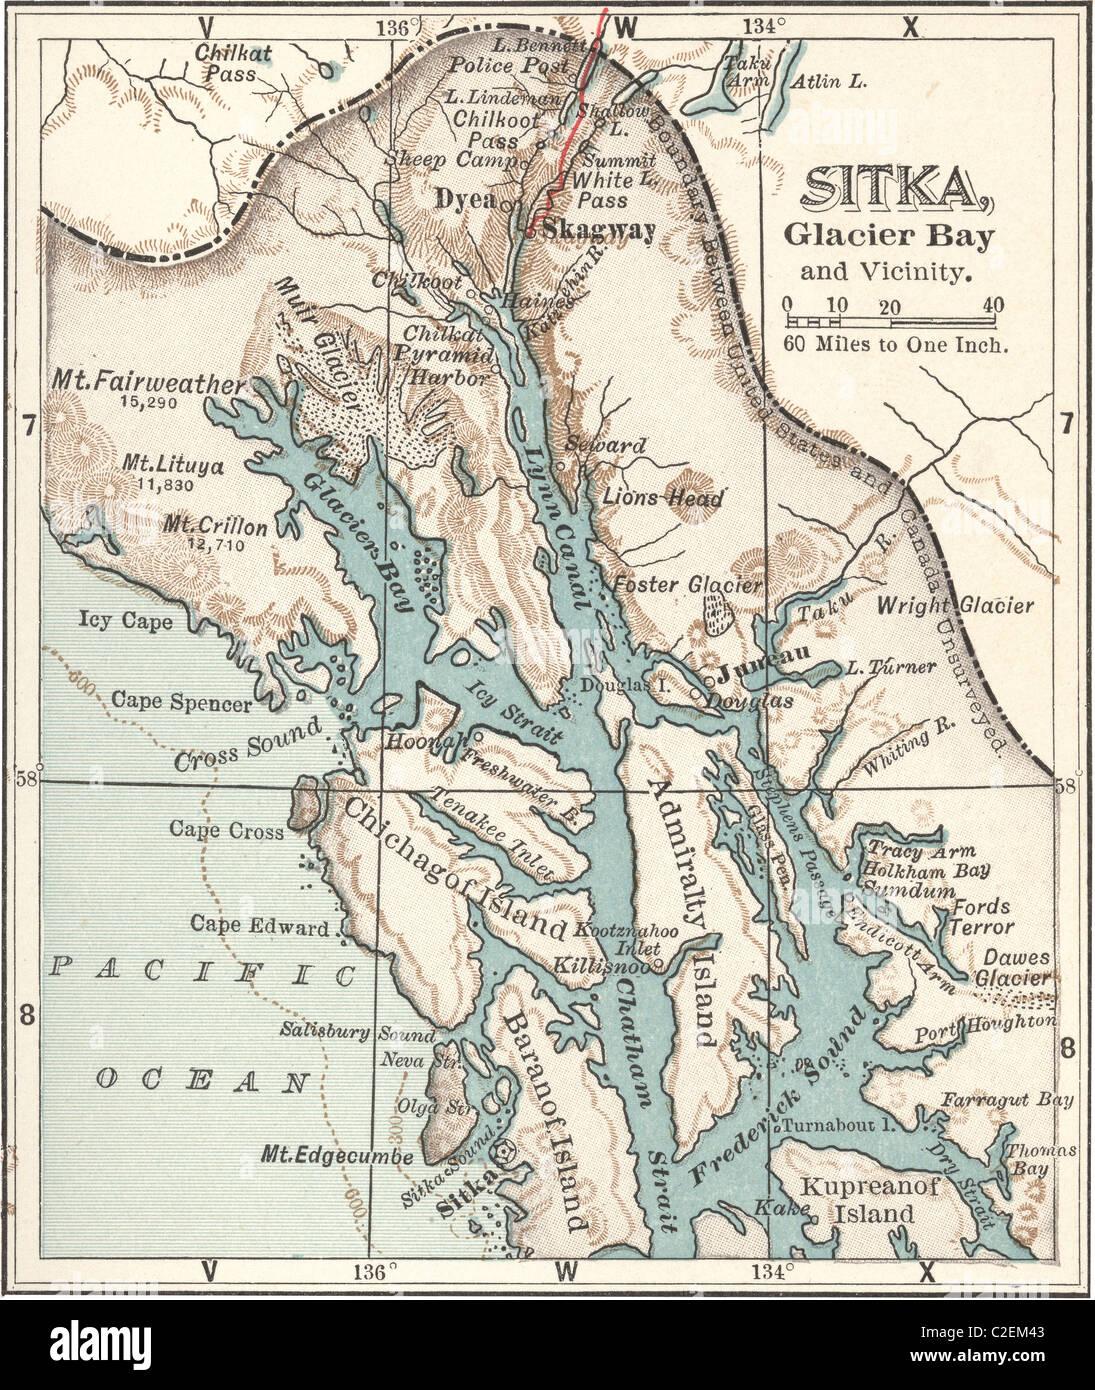 Map Of Sitka And Glacier Bay Alaska Stock Photo 35973171 Alamy